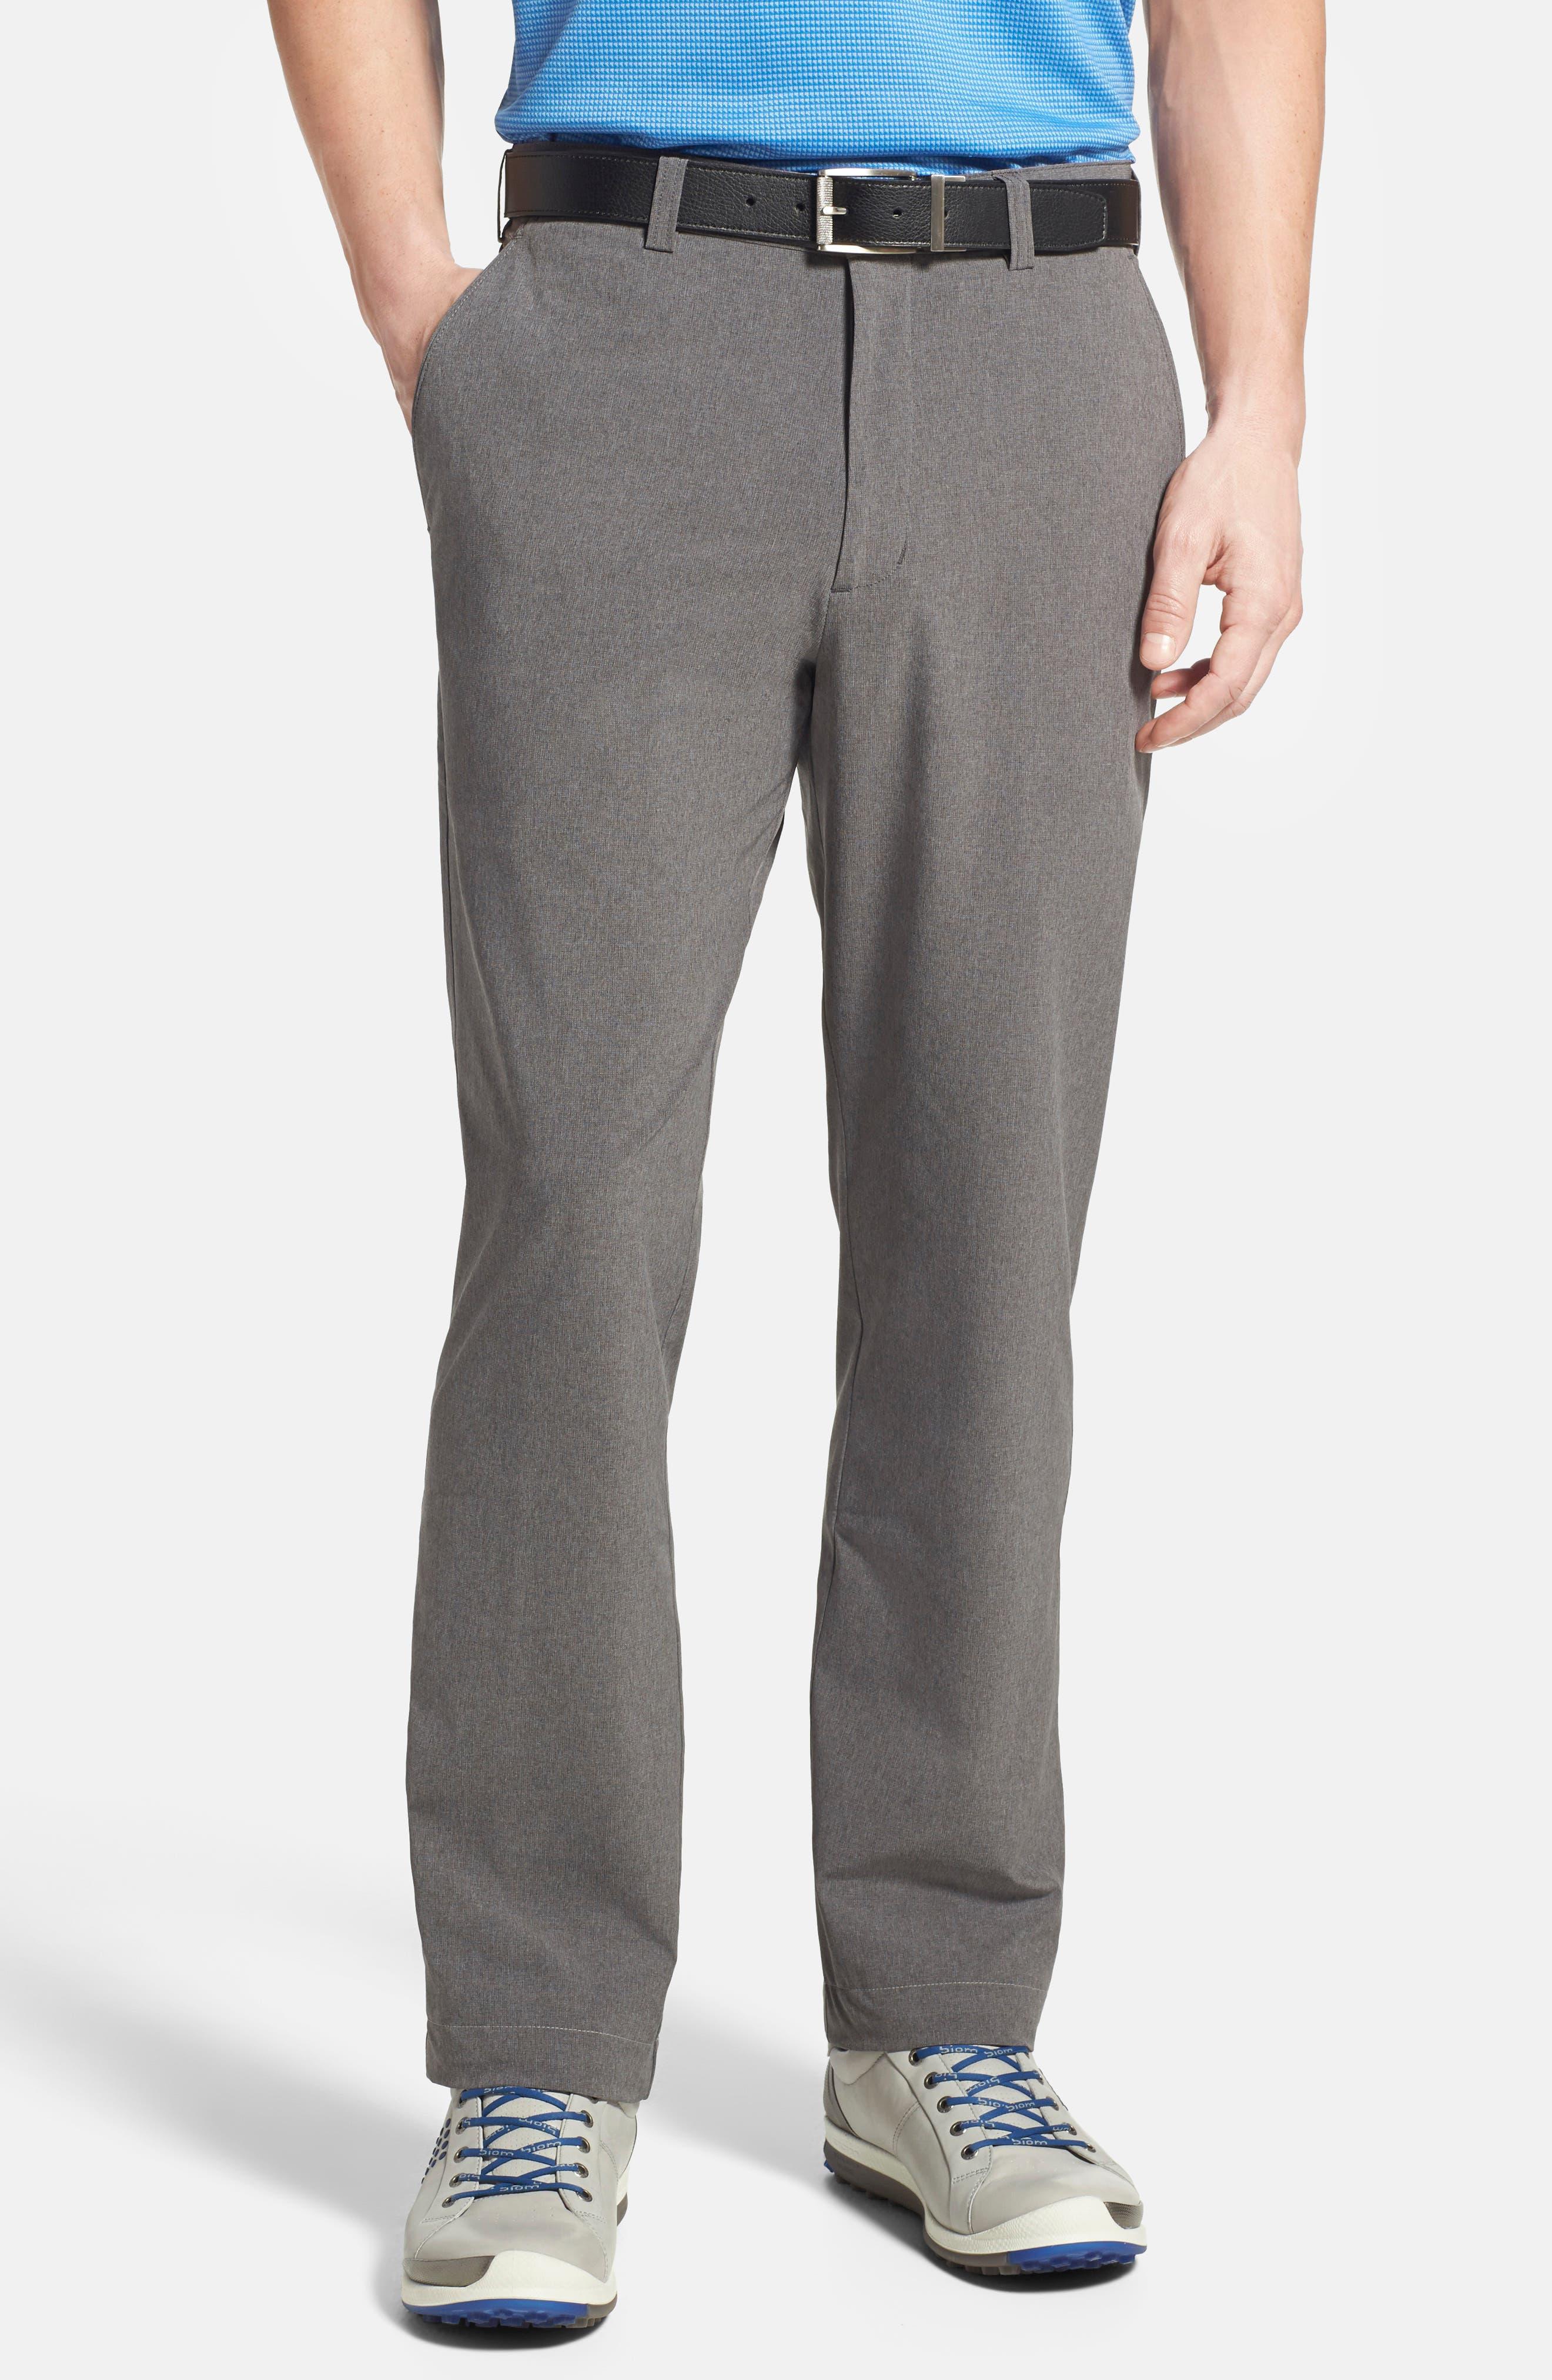 Bainbridge DryTec Moisture Wicking Flat Front Pants,                             Alternate thumbnail 4, color,                             IRON GREY